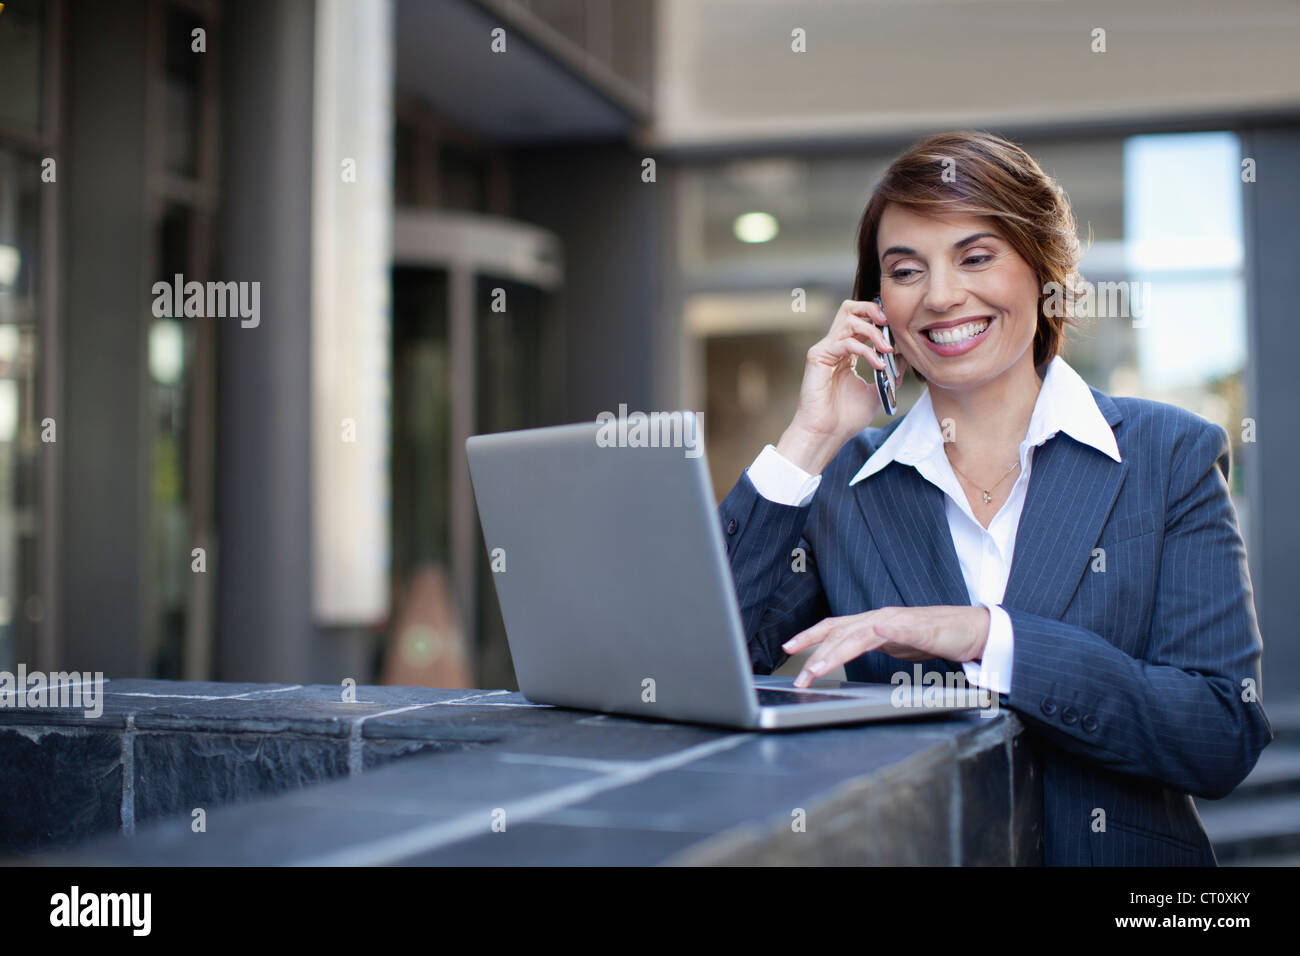 Businesswoman using laptop outdoors - Stock Image